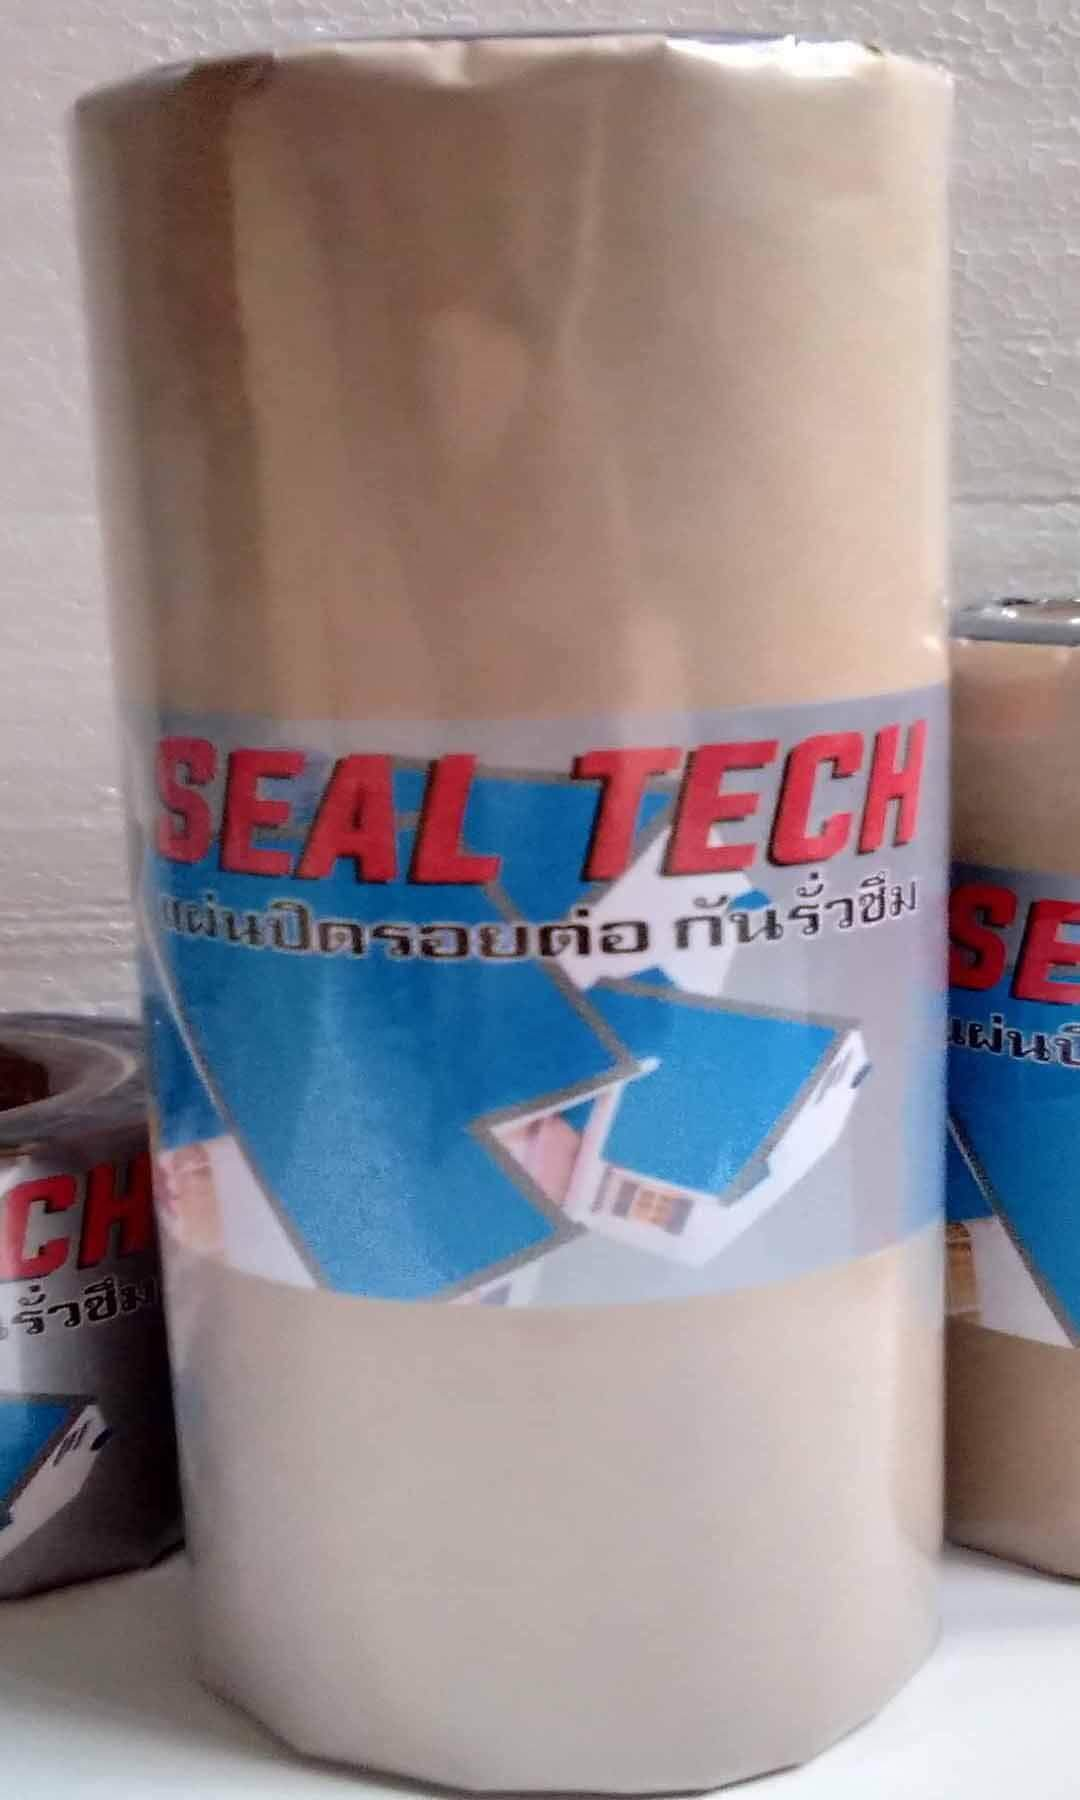 Cc: SEAL TECH แผ่นปิดรอยต่อ กันรั่วซึม 30 ซม.X 3 ม.